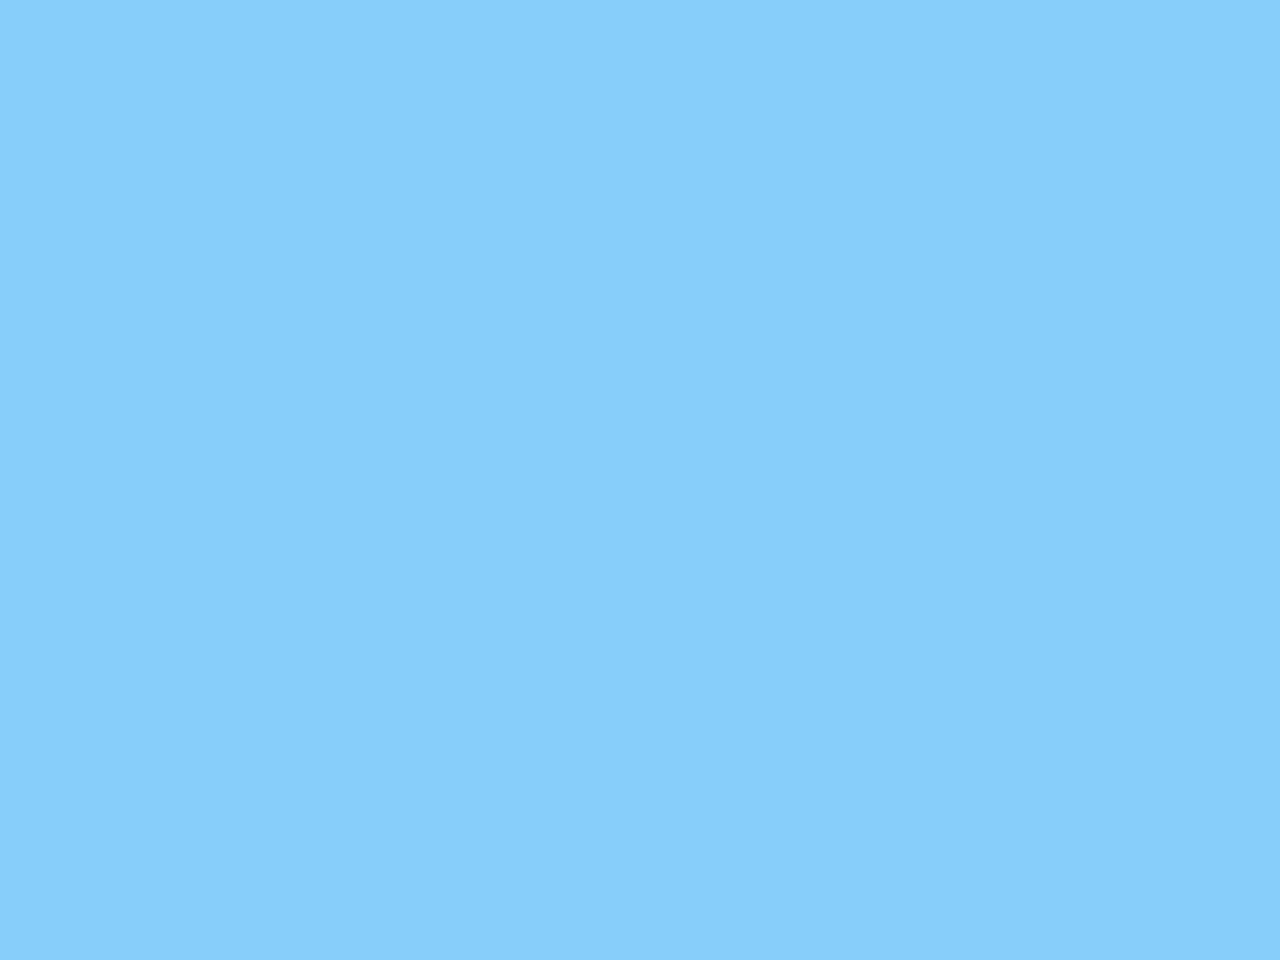 1280x960 Light Sky Blue Solid Color Background